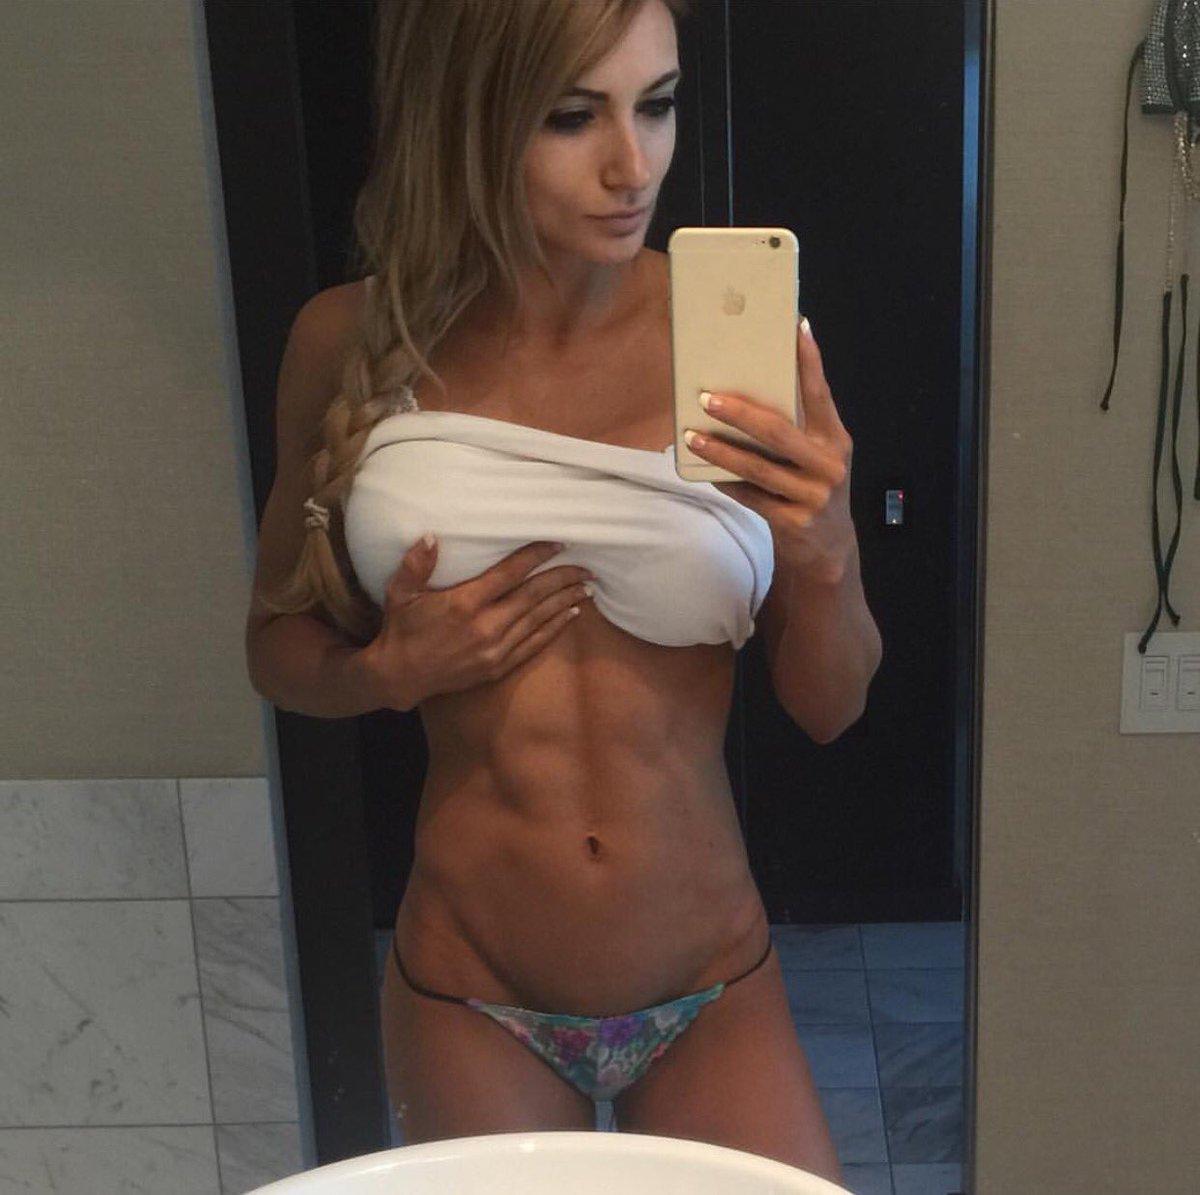 Feet Alyssa Germeroth  nude (99 pics), Snapchat, braless